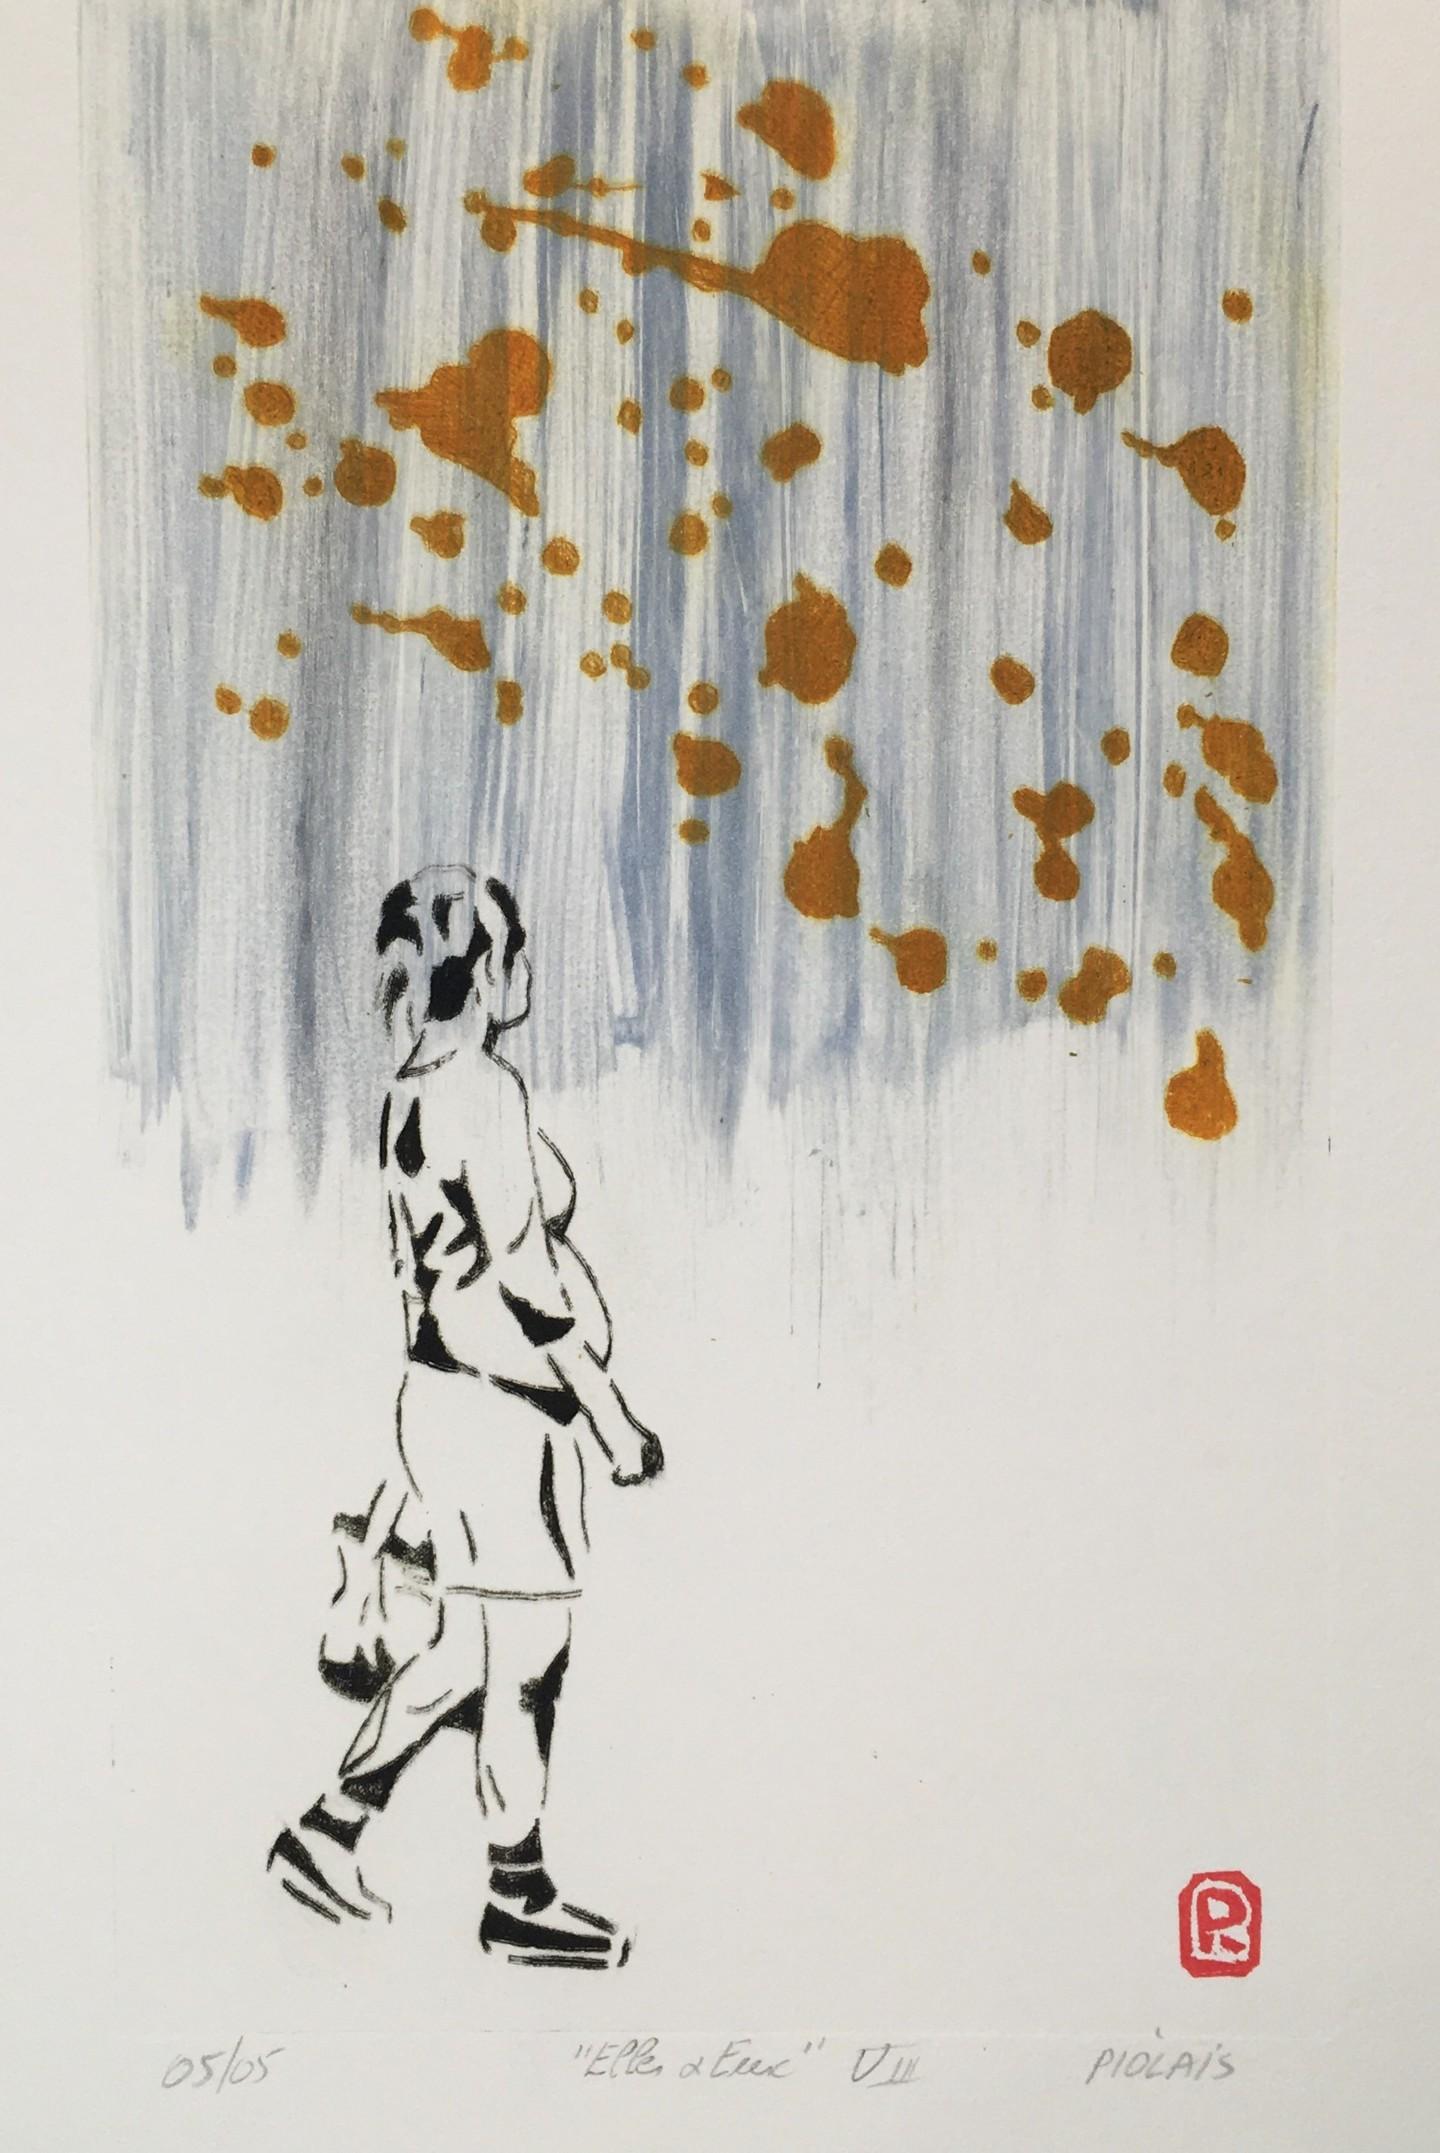 Rosemary Piolais - Elles & Eux - N°VIII